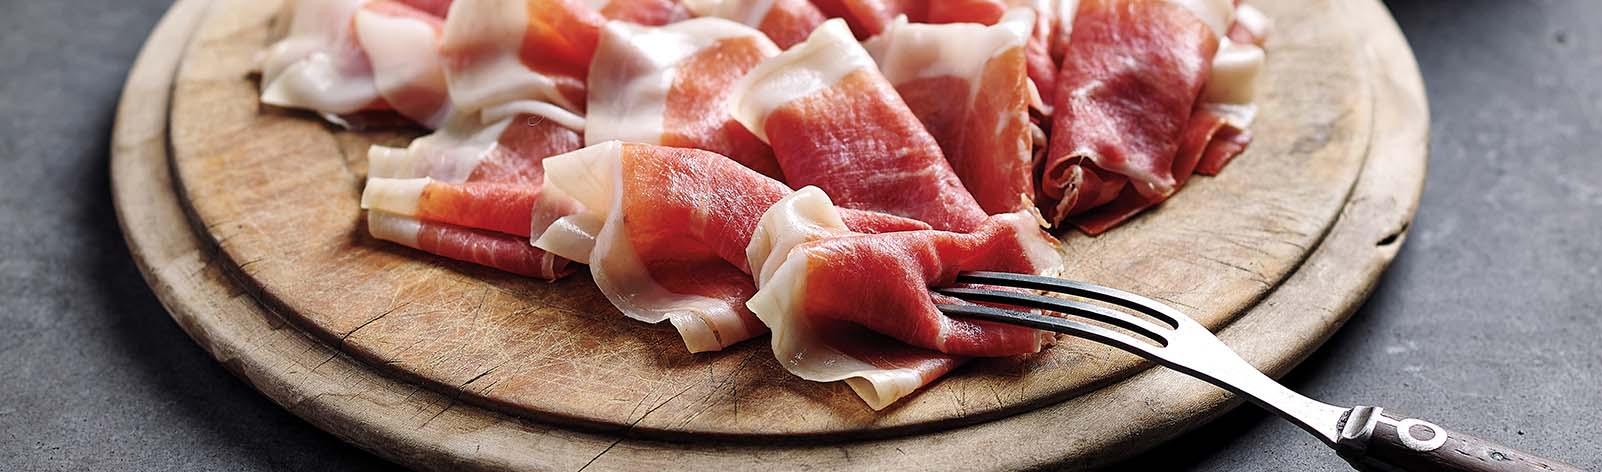 Surryano Iberico Ham Slices Desktop Slider